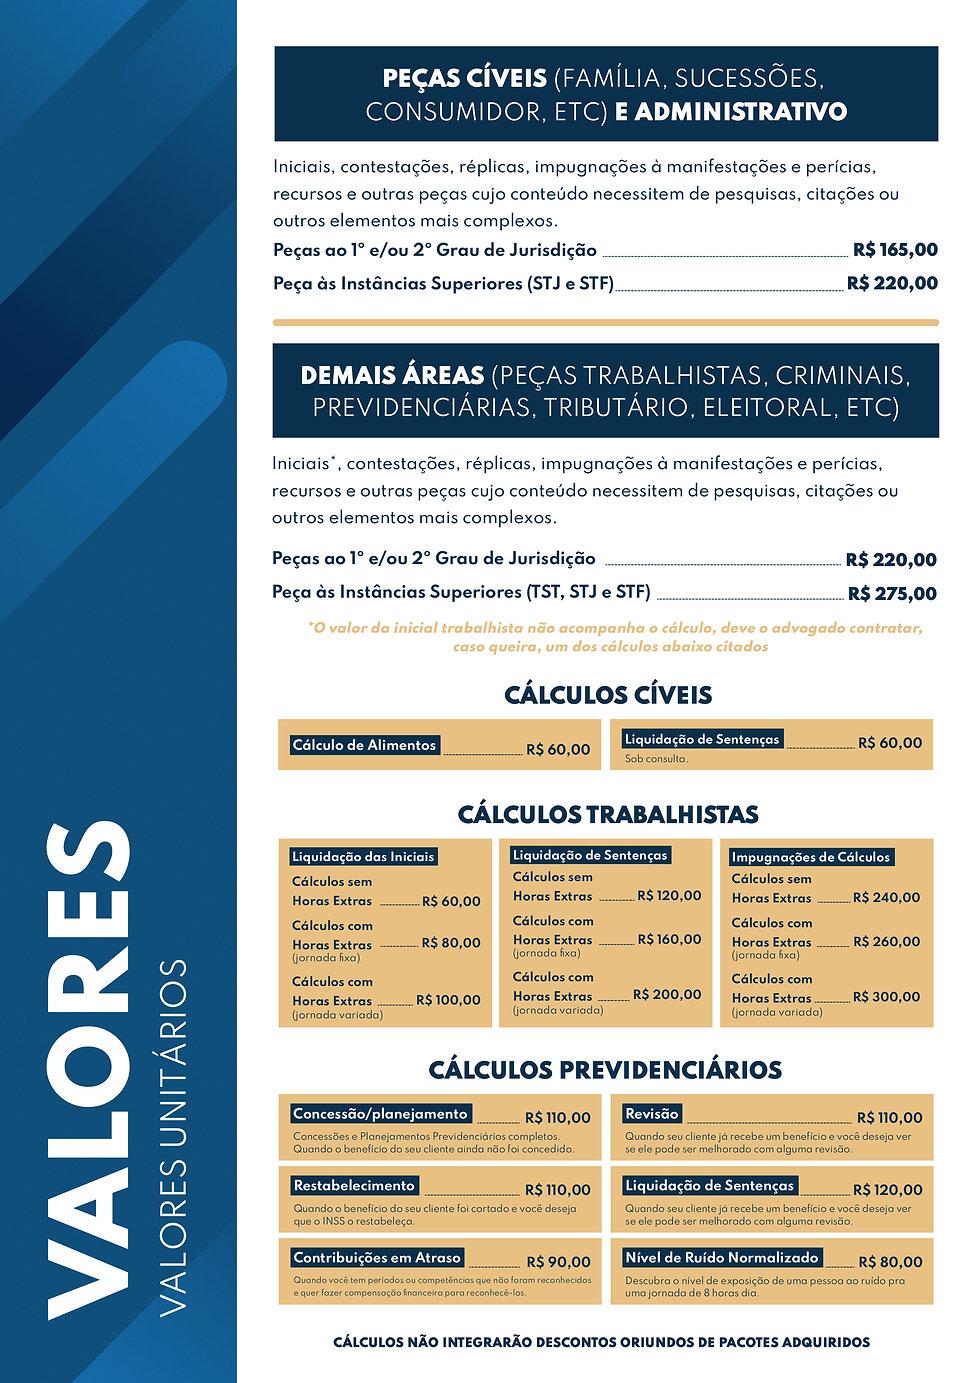 # CATÁLOGO IURIS PETIÇÕES_page-0005.jpg